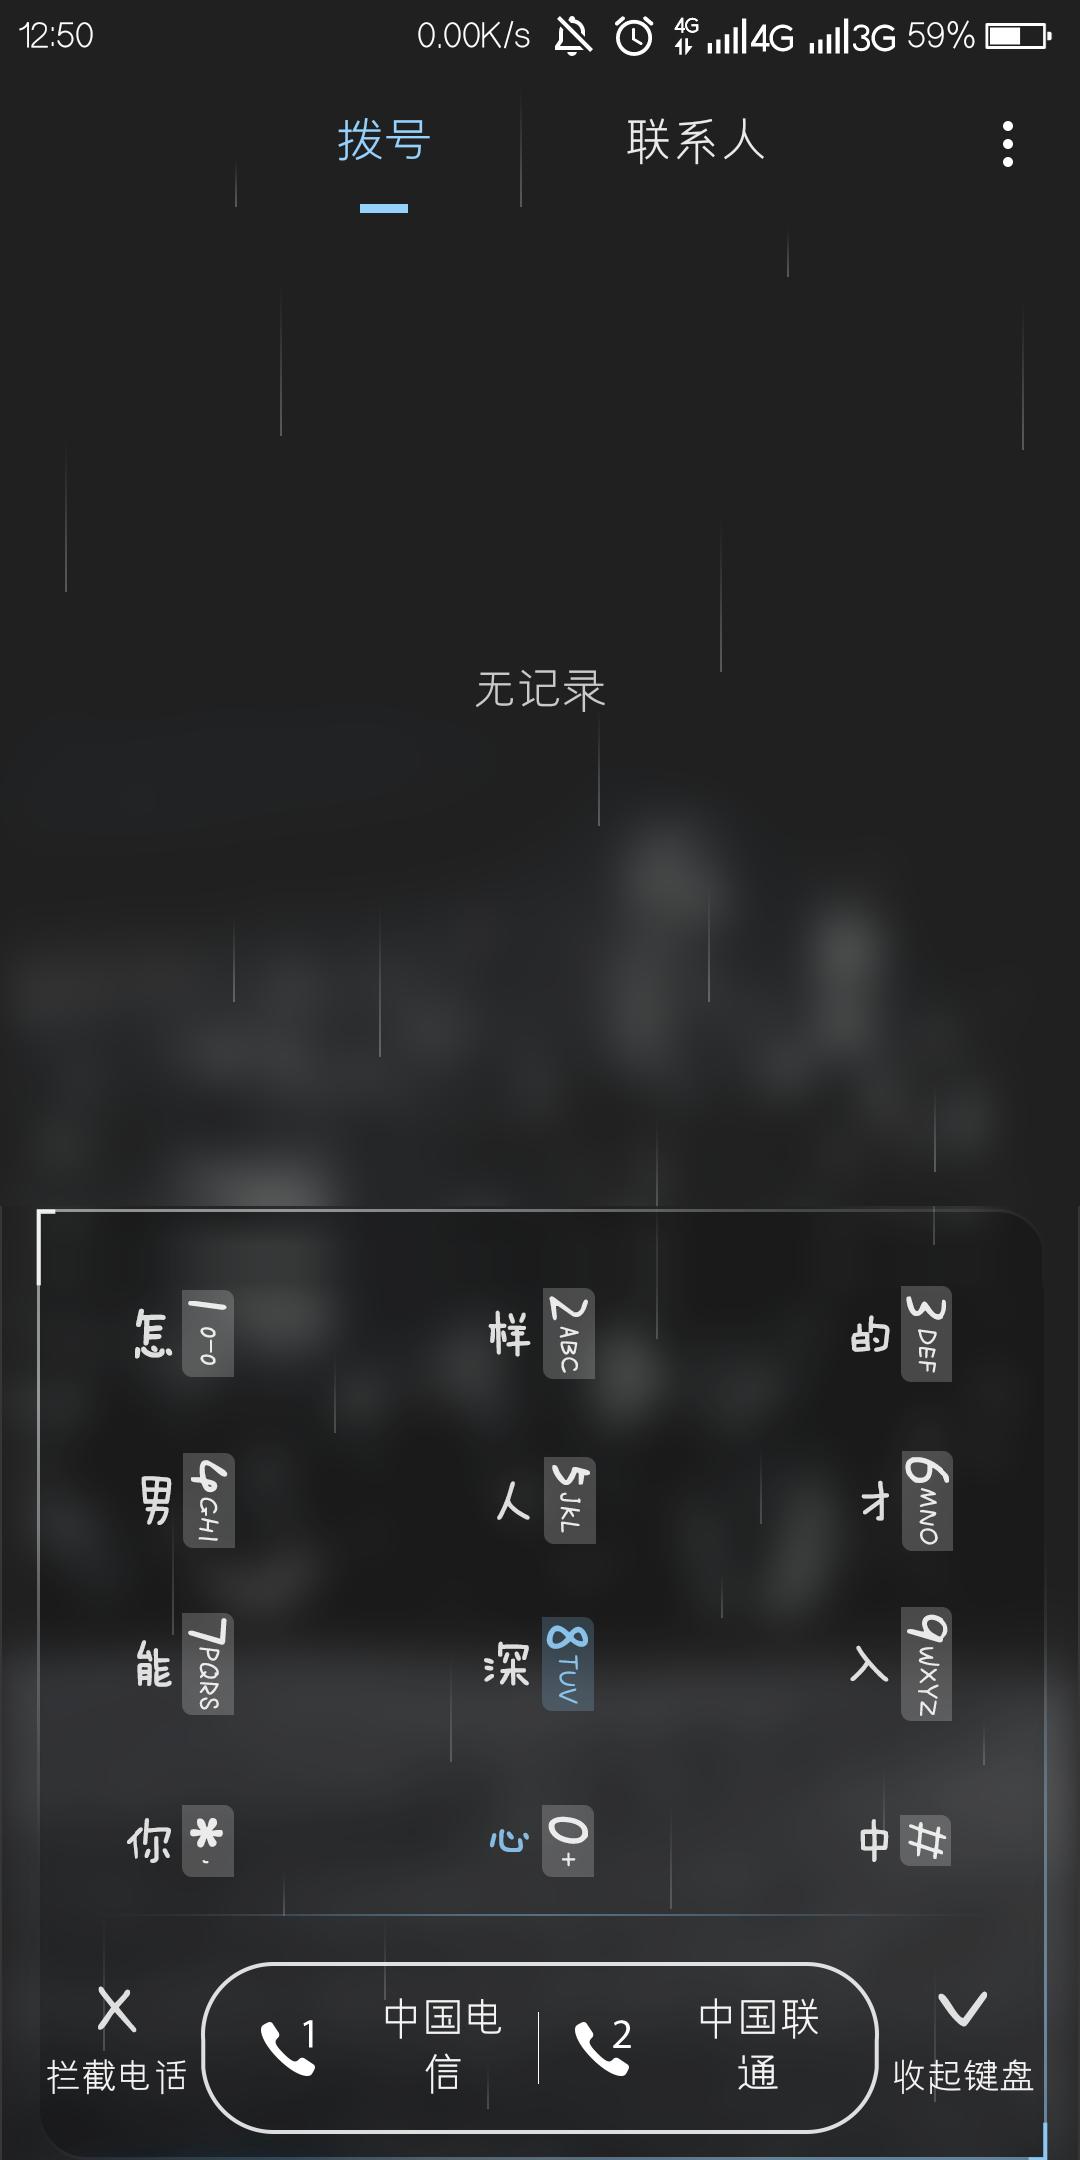 Screenshot_2018-09-15-12-50-10.png